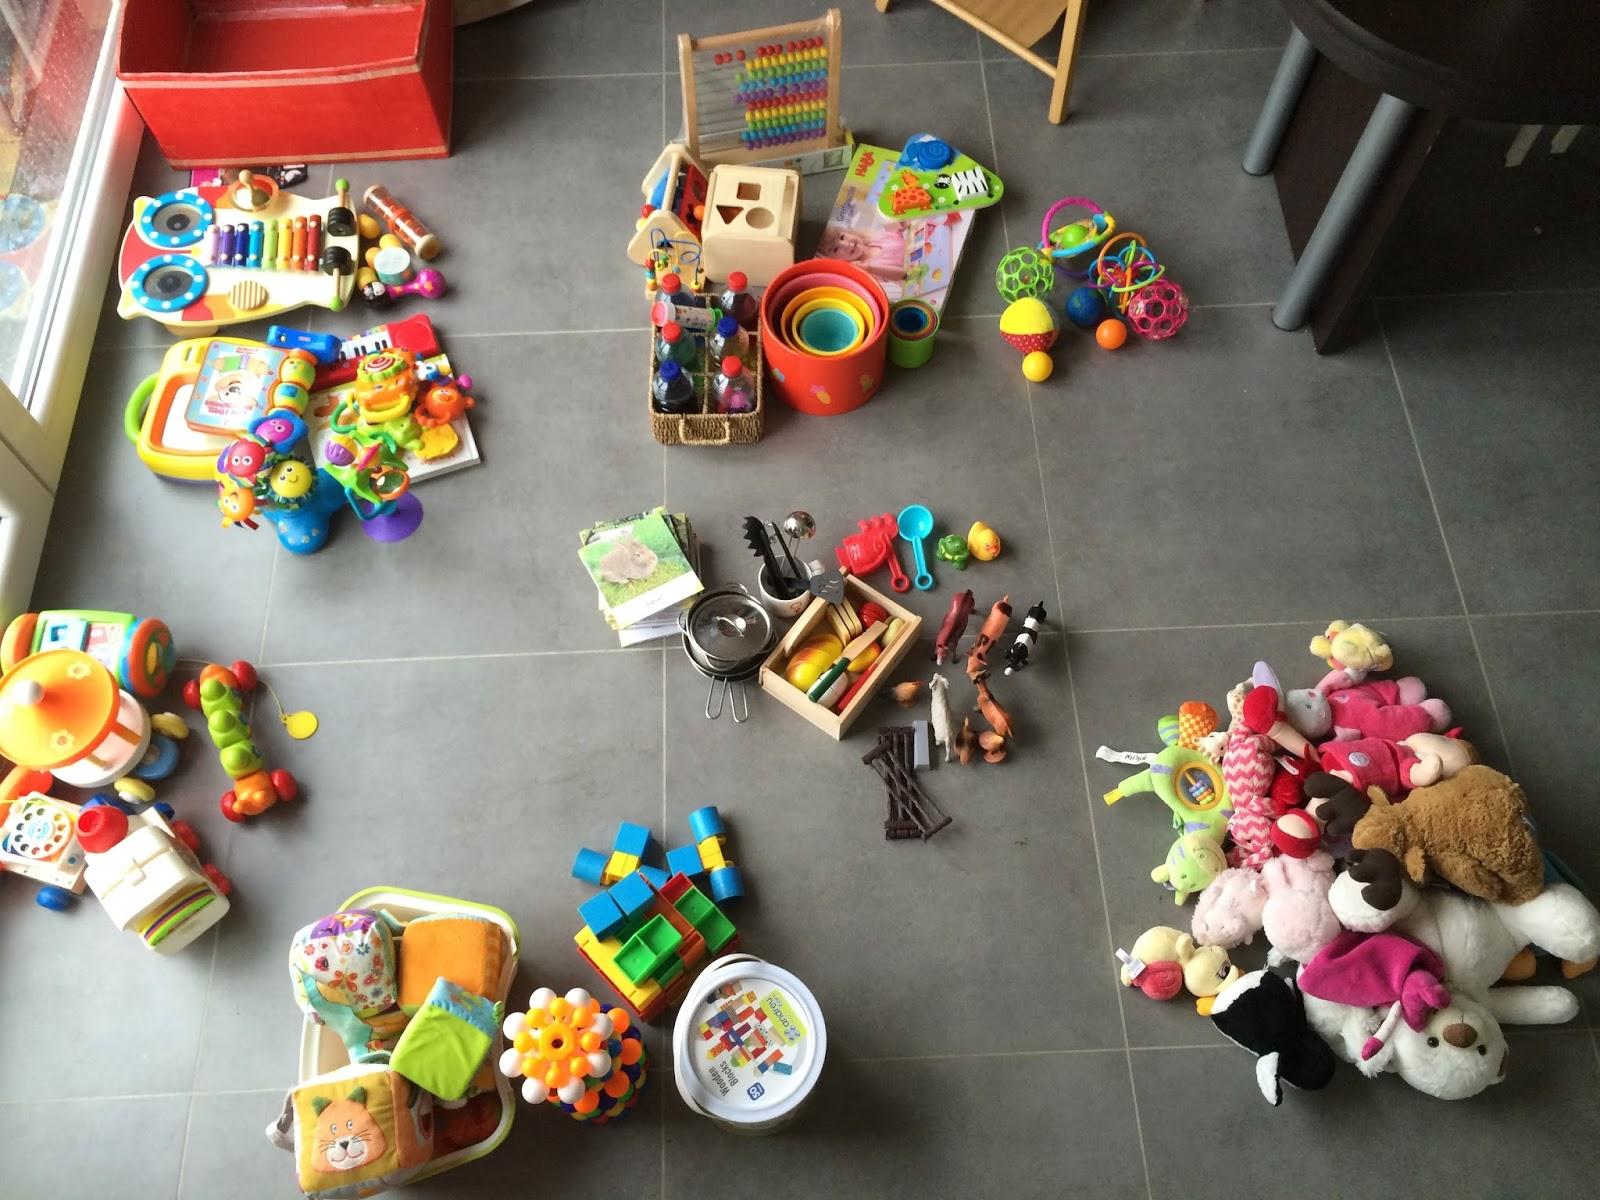 organiser la rotation des jouets de b b montessori ma sauce. Black Bedroom Furniture Sets. Home Design Ideas